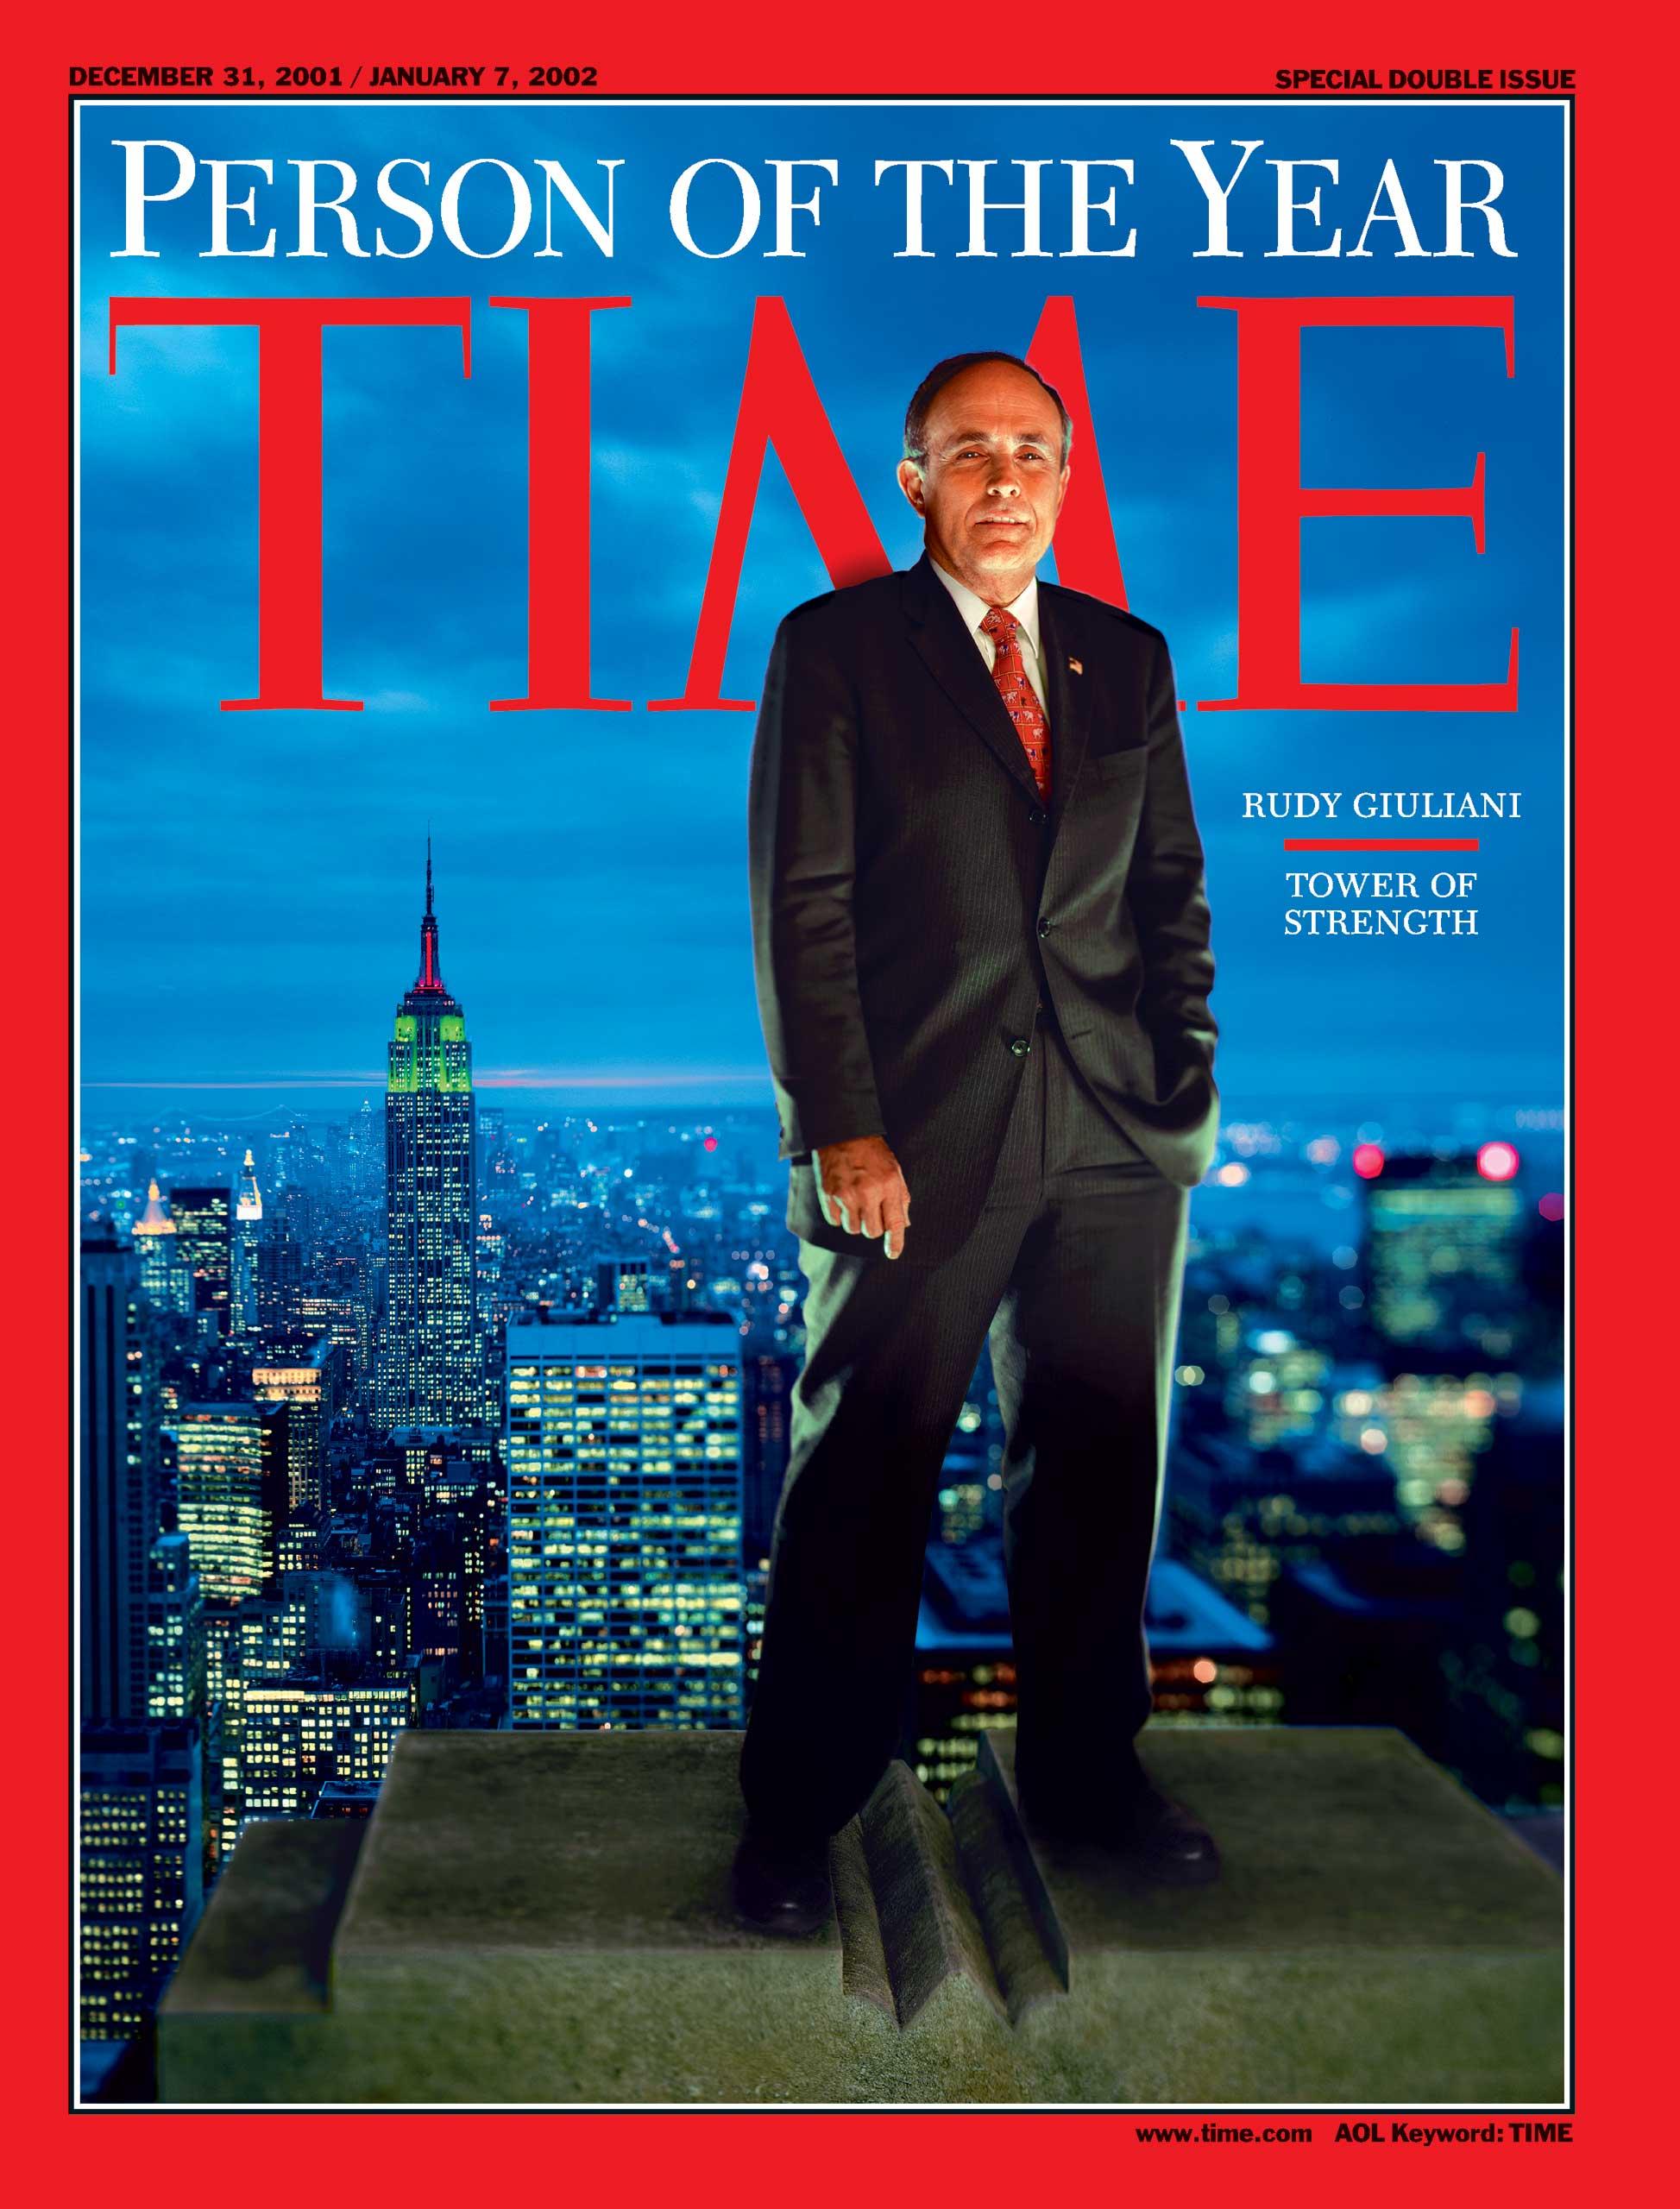 2001: Rudy Giuliani